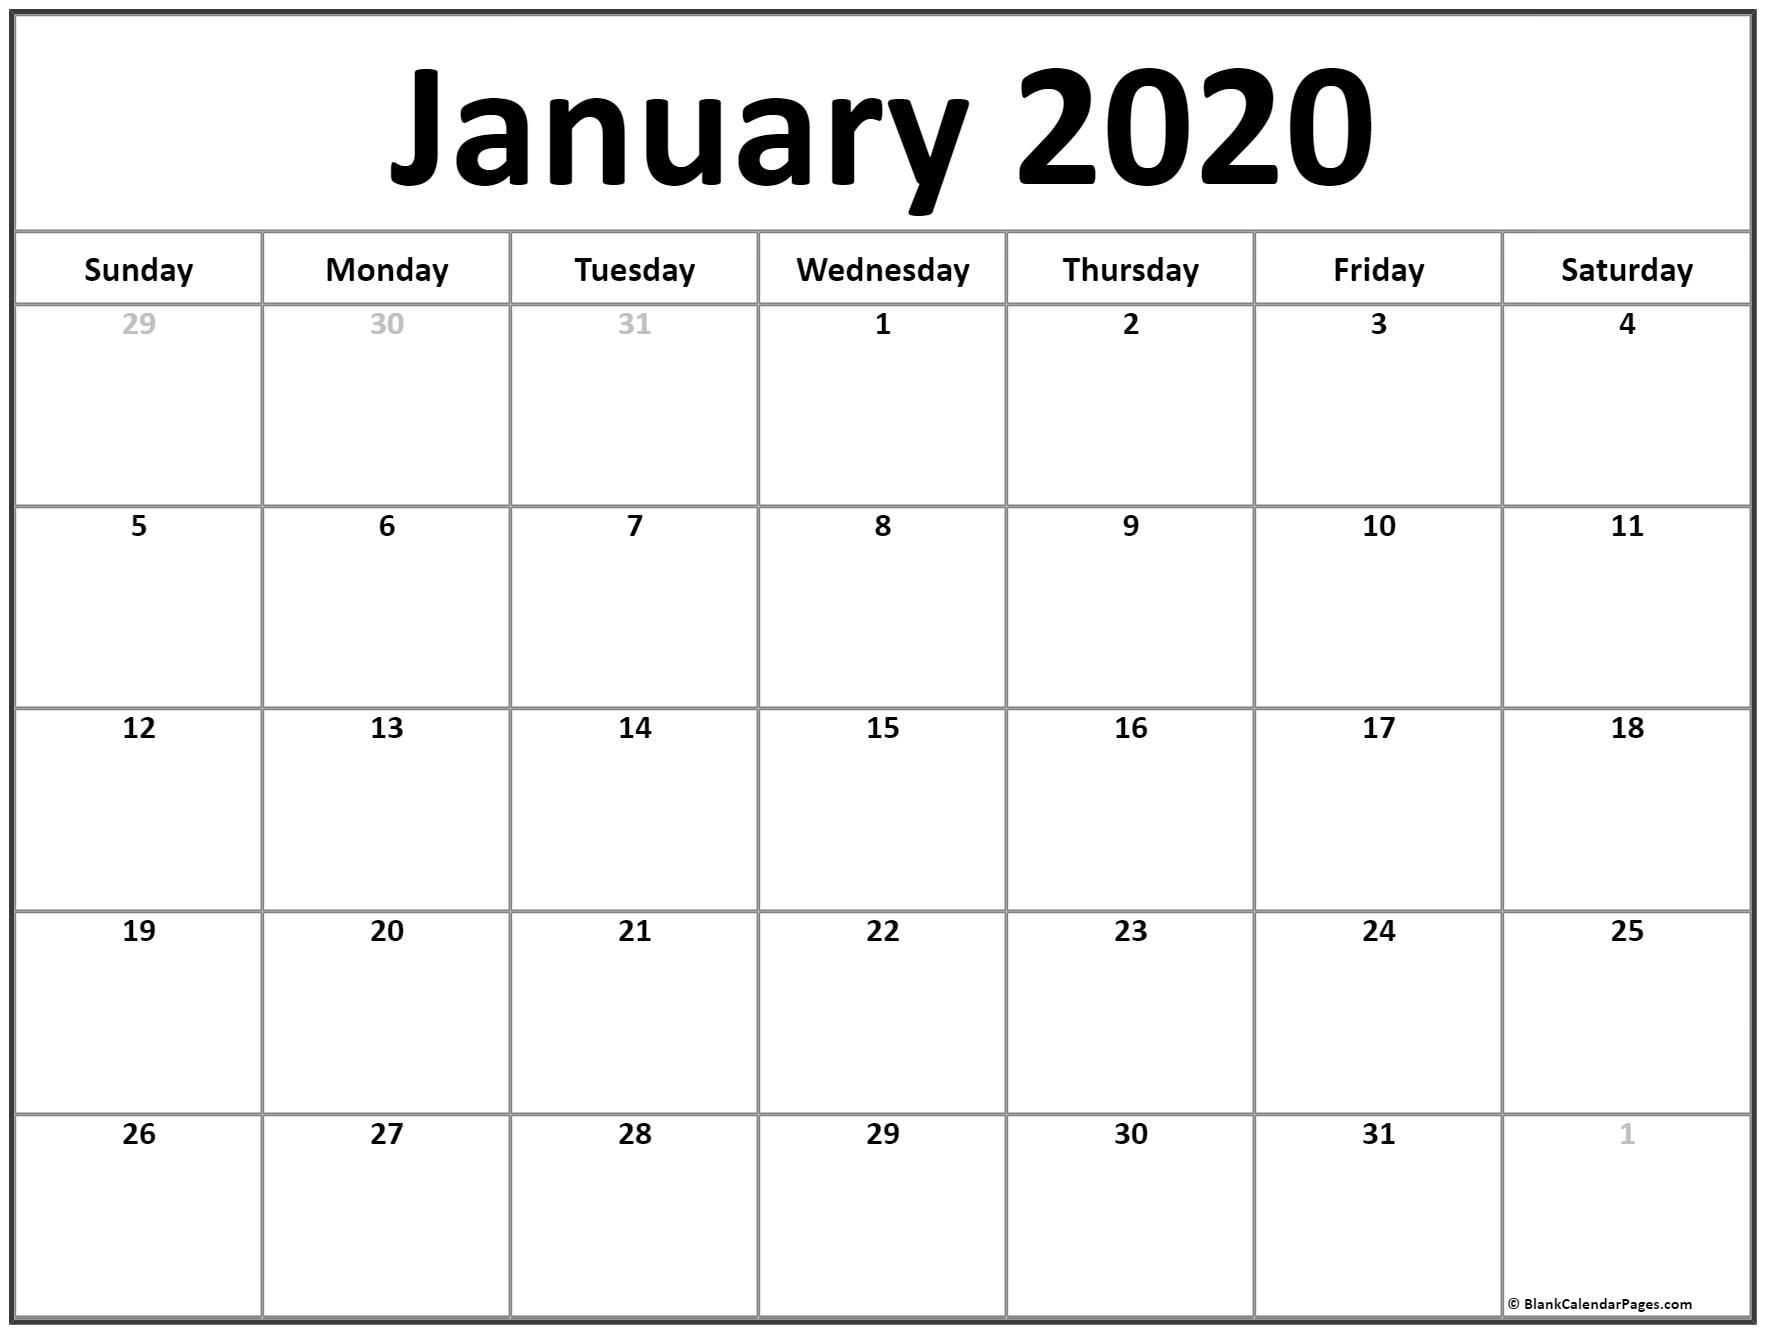 January 2020 Calendar | Free Printable Monthly Calendars-Calendar For January 2020